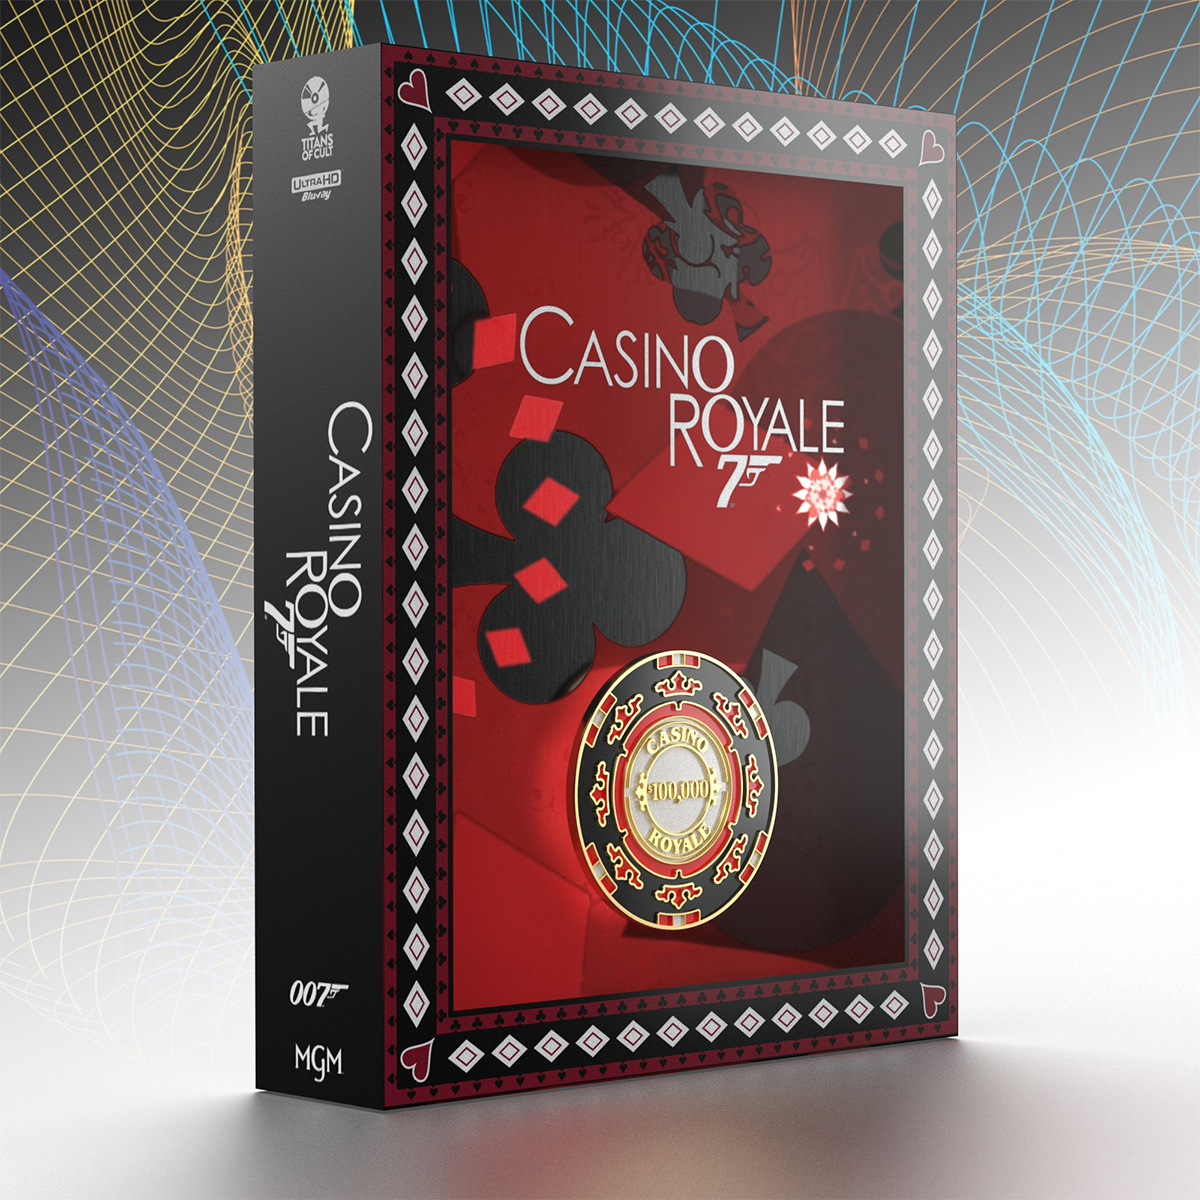 Casino_Royale_Galerie_Titans_of_Cult_01.jpg